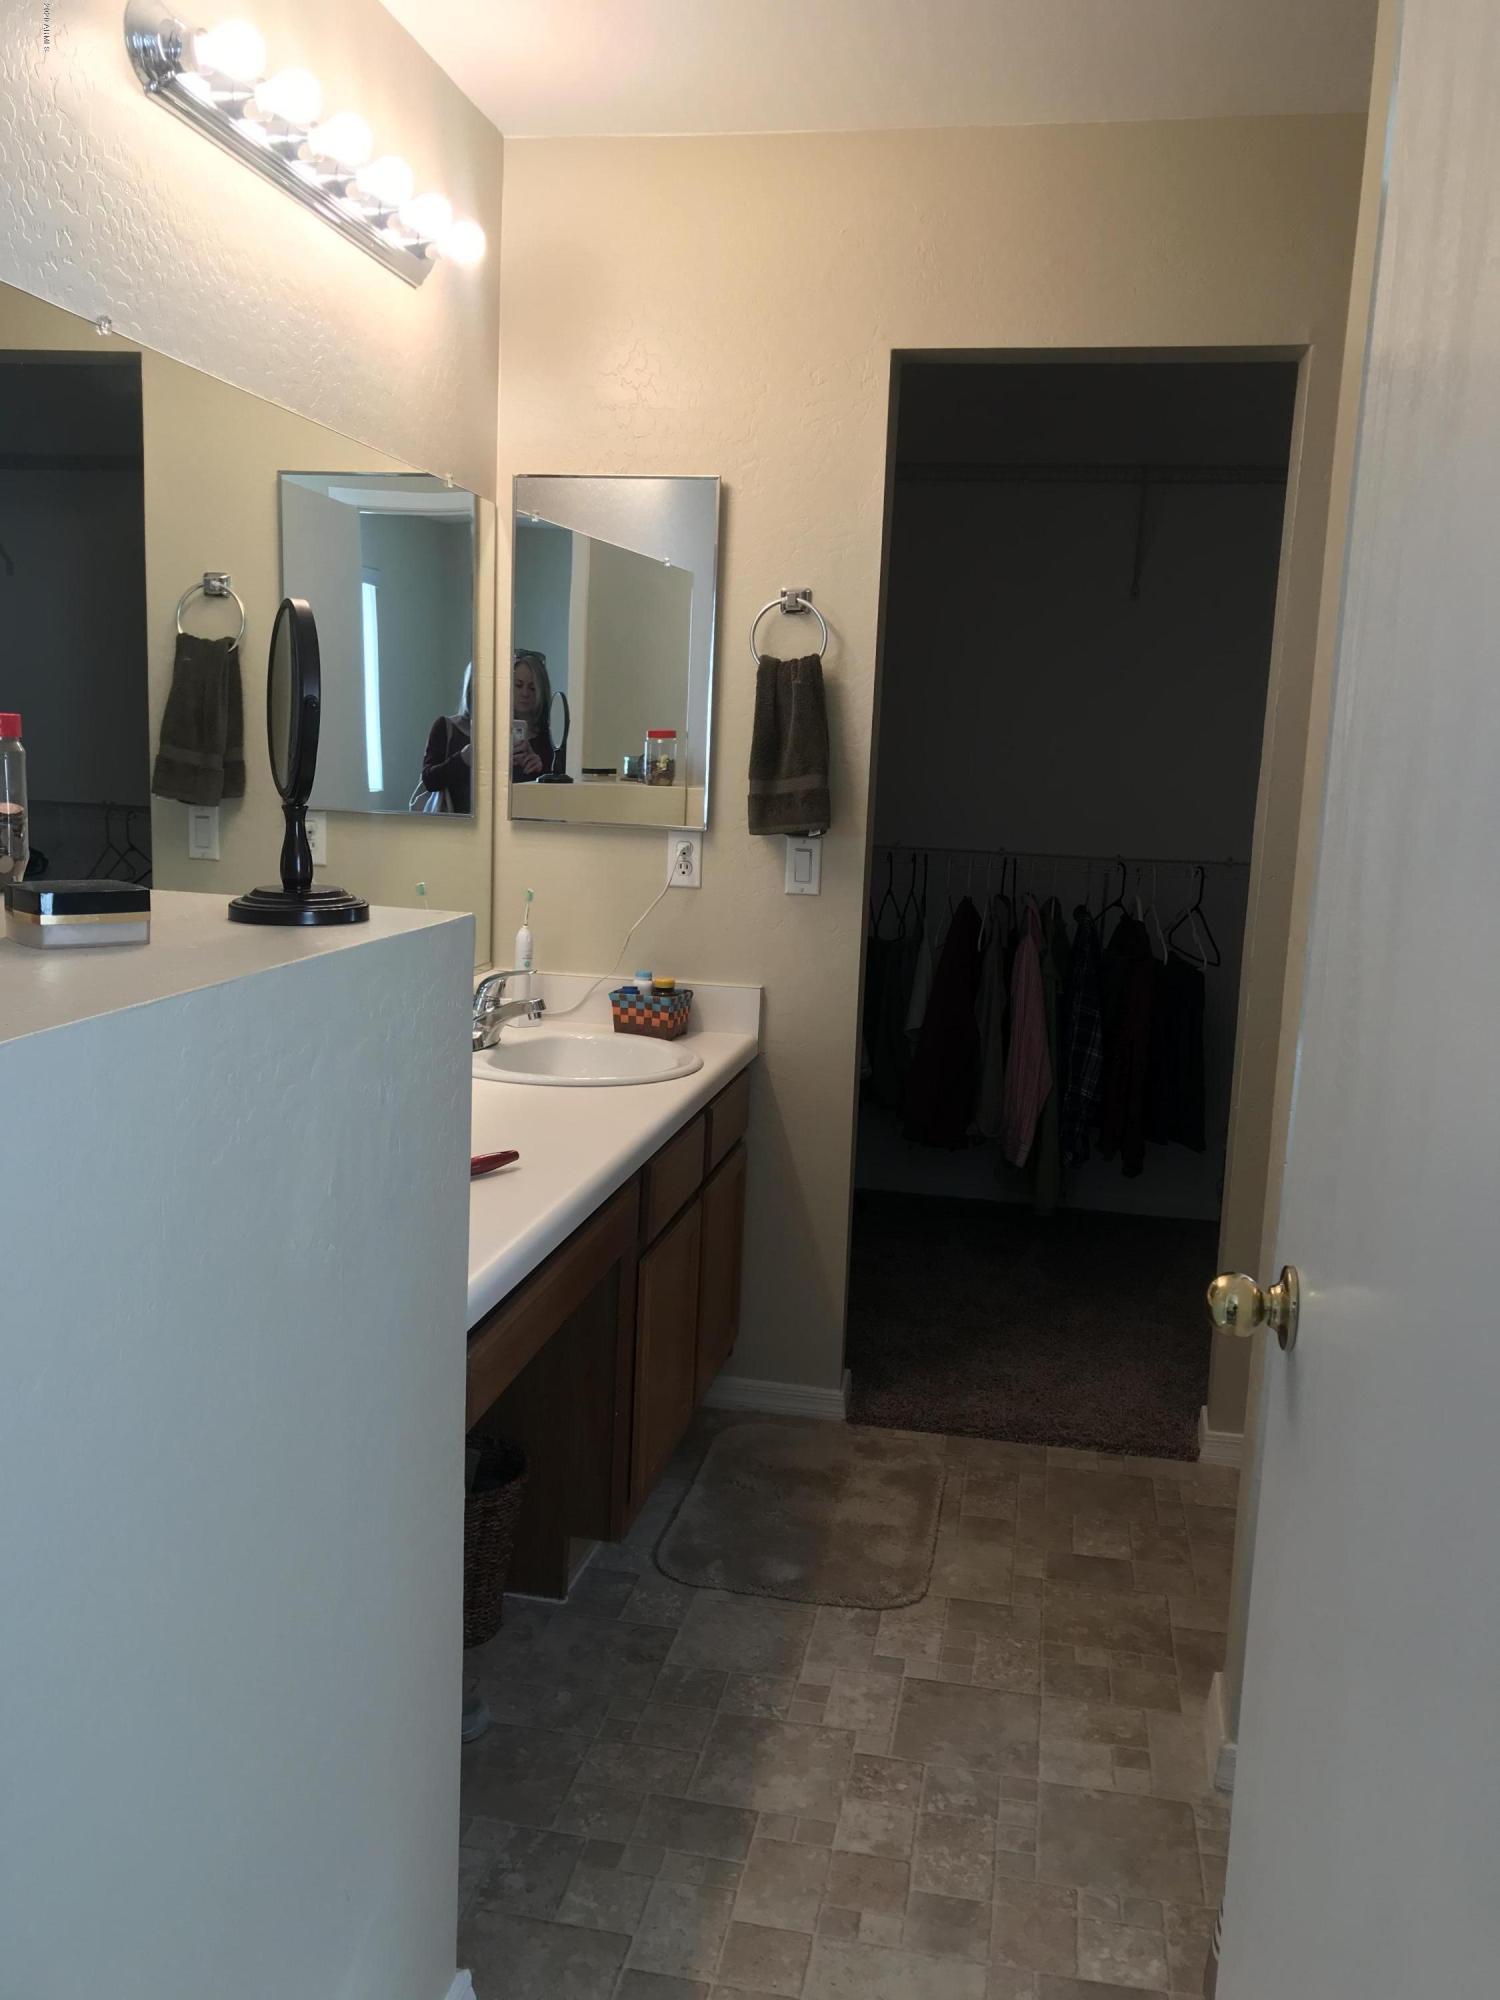 23987 W WAYLAND Drive, Buckeye, Arizona 85326, 3 Bedrooms Bedrooms, ,Residential,For Sale,23987 W WAYLAND Drive,6042803